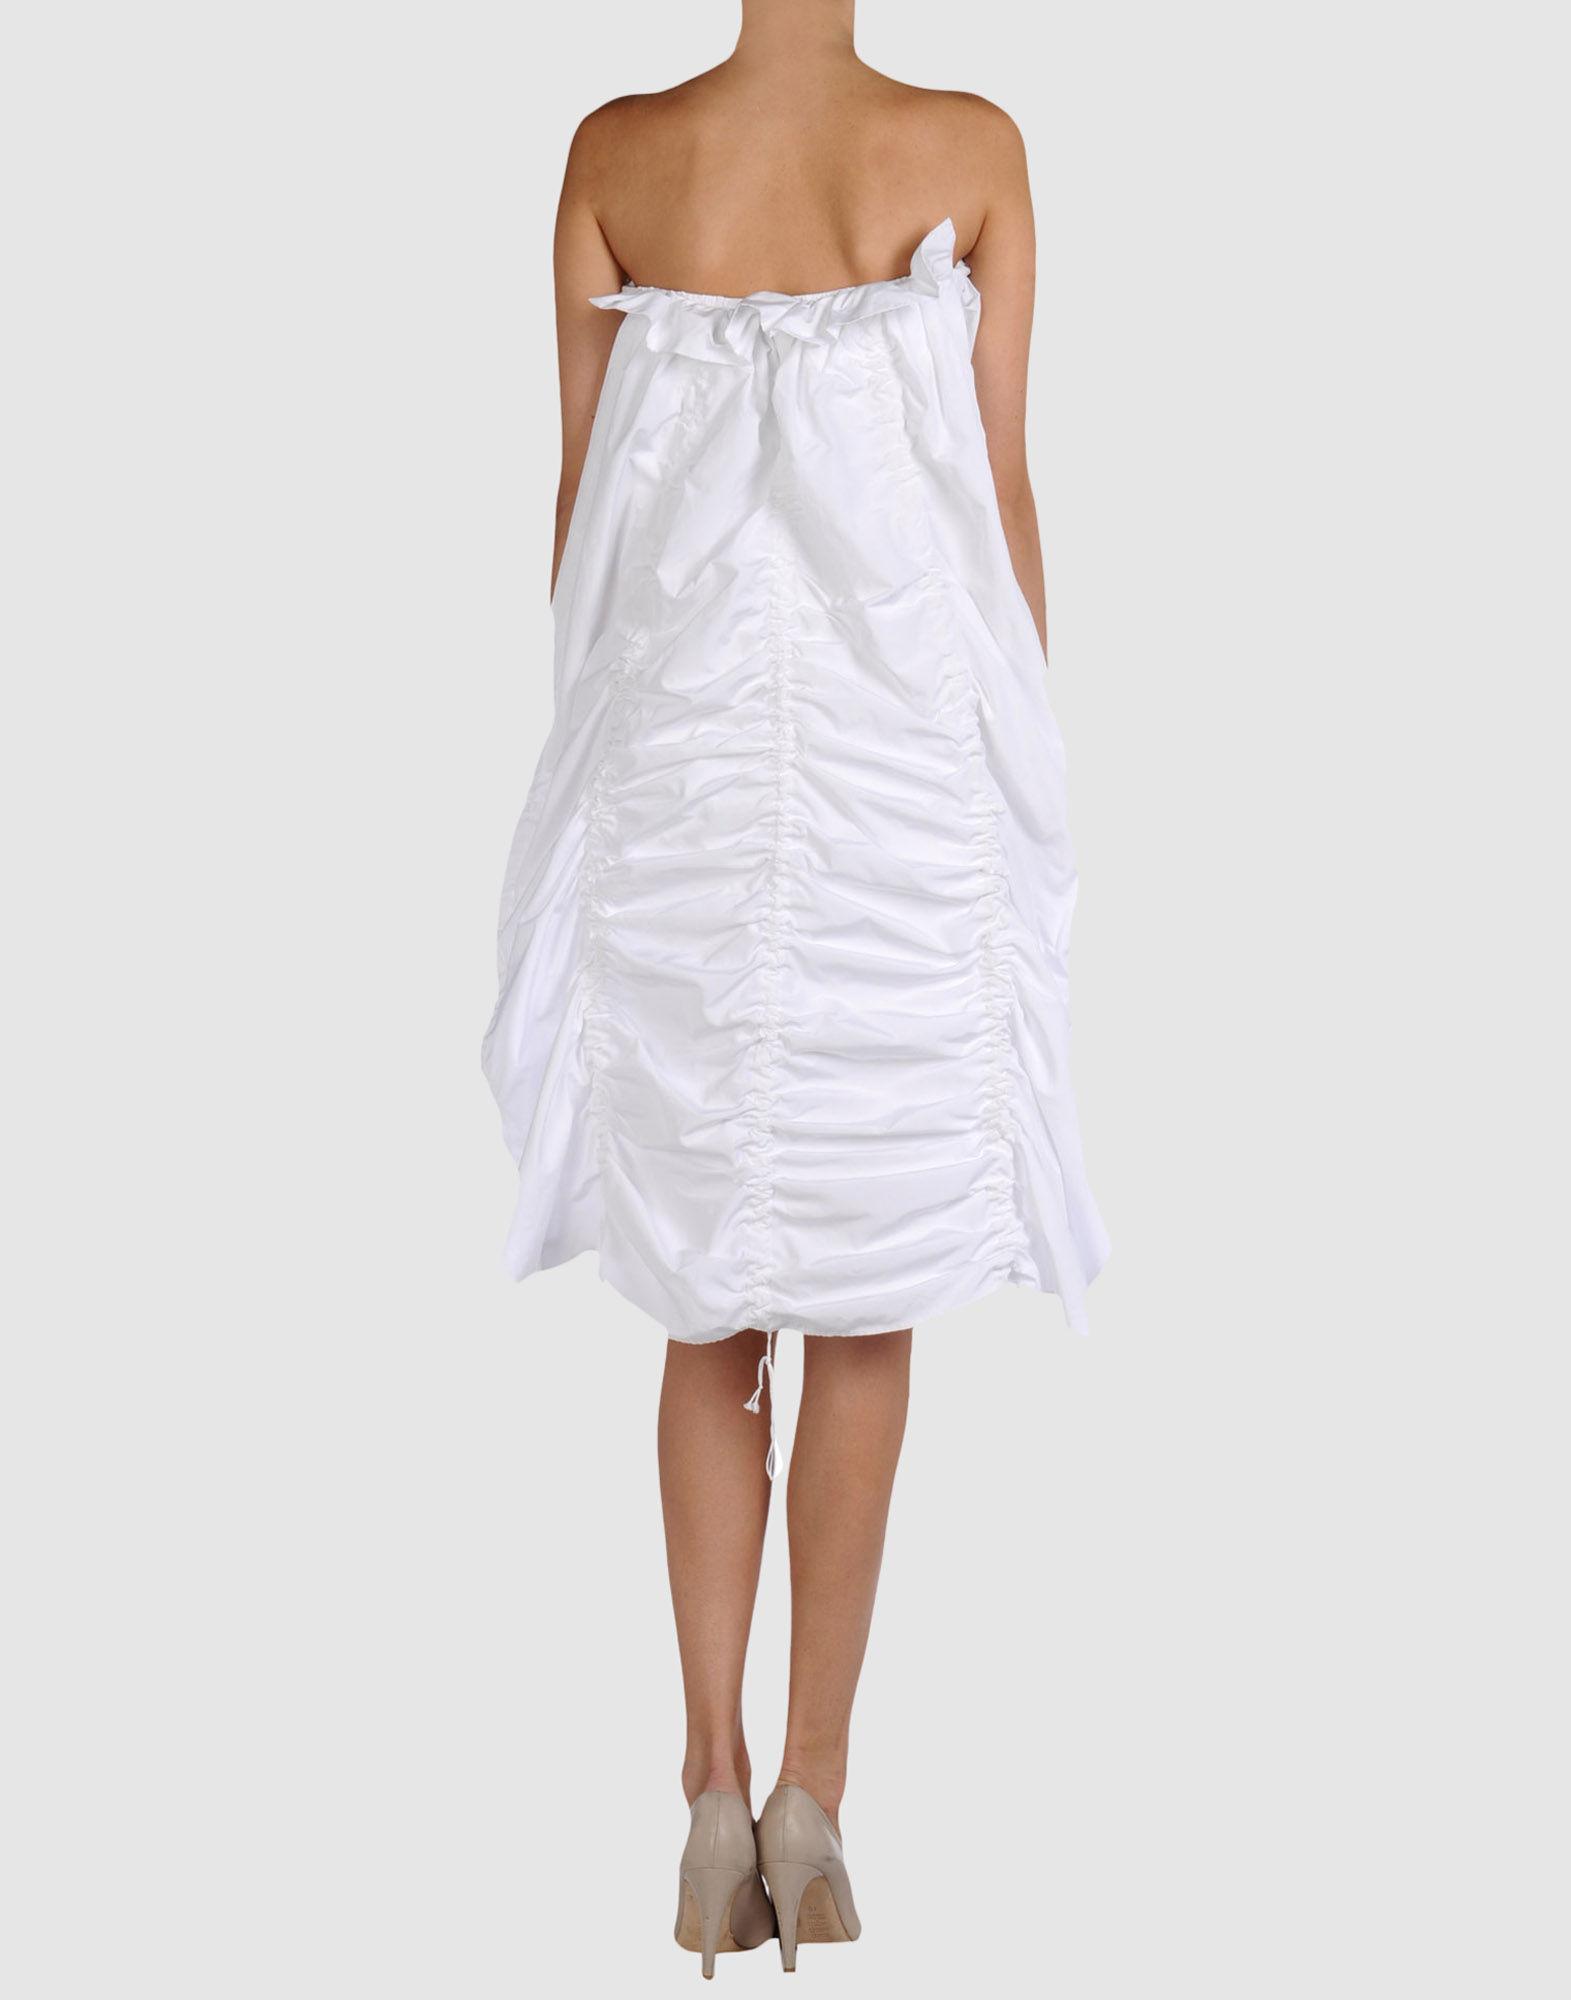 34237419CX 14 r - Βραδυνα Φορεματα Yves Saint Laurent Rive Gauche Κωδ.19